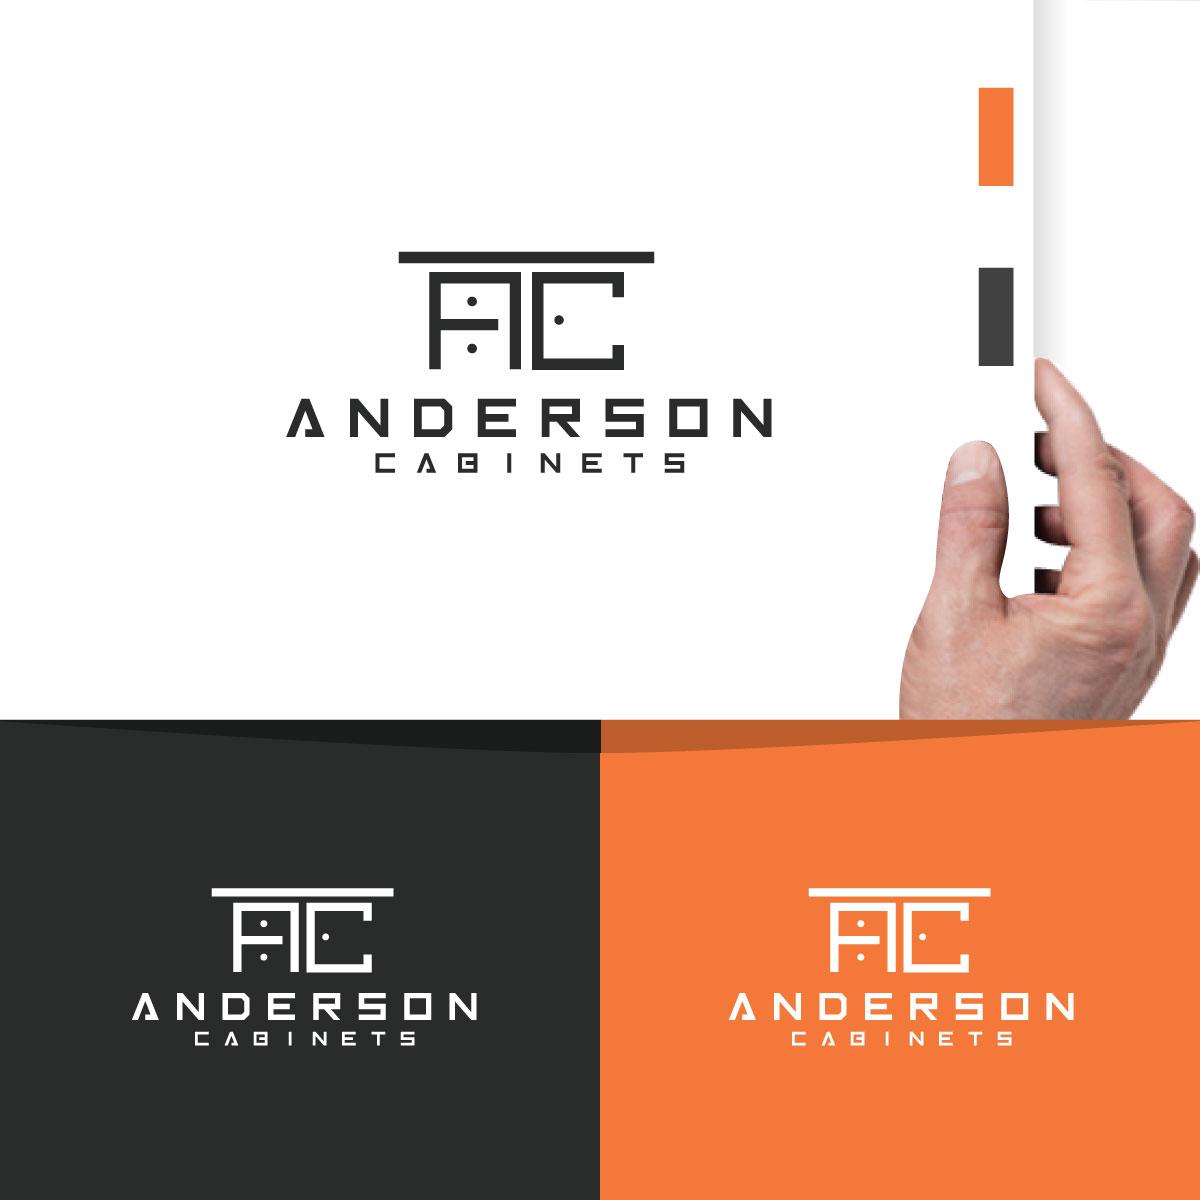 Logo Design By Nibedita.mandal123 For Anderson Cabinets   Design #17049214